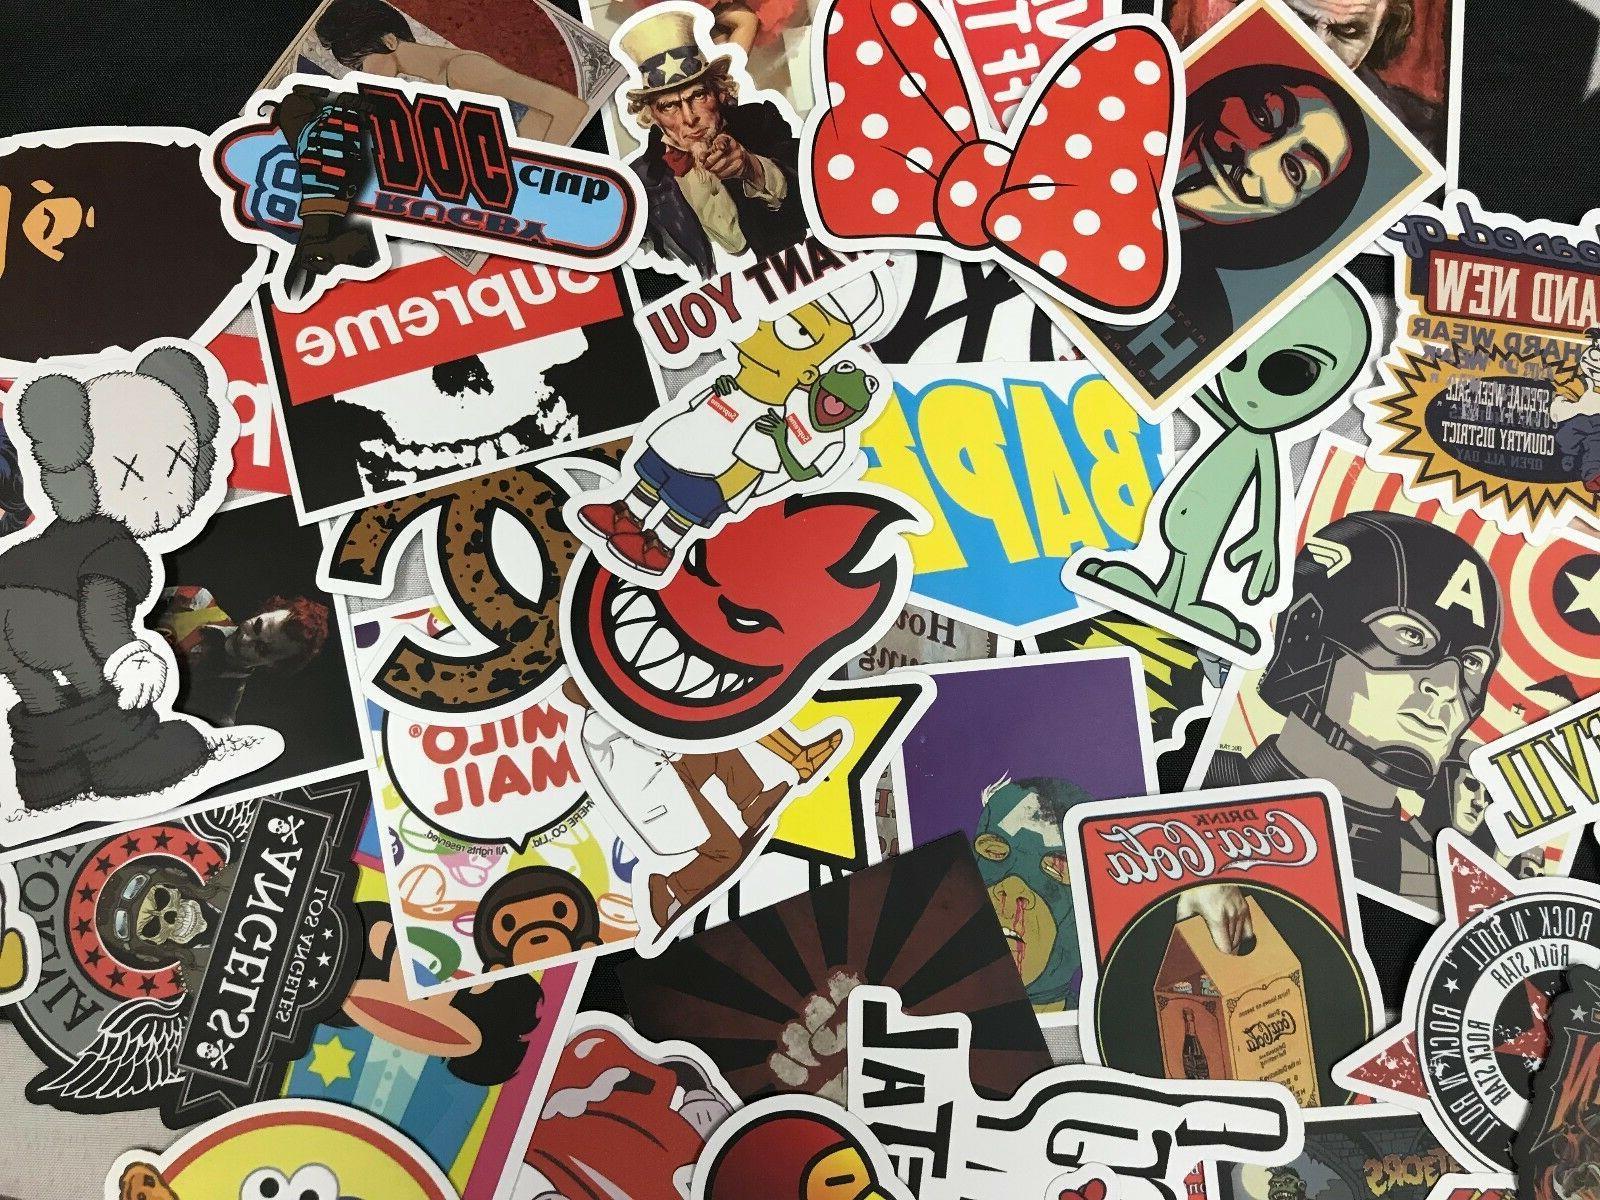 Lot 100 Random Laptop Stickers bomb Luggage